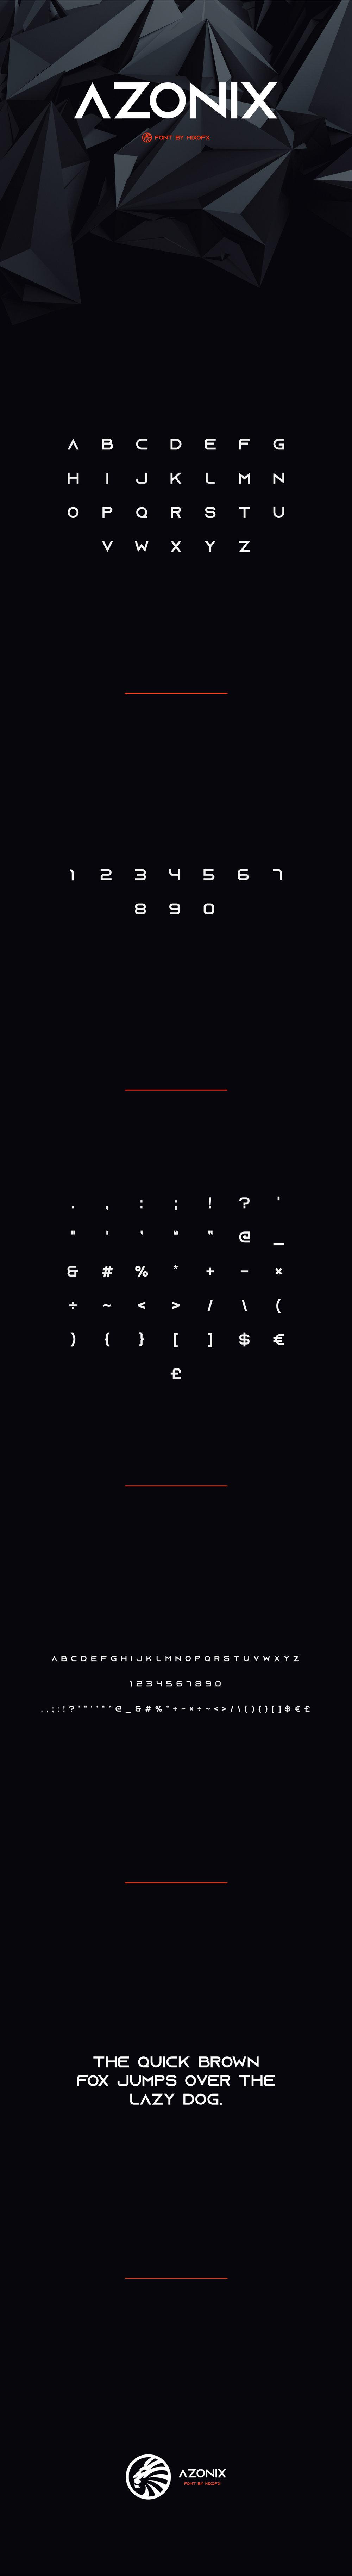 Azonix-Long.jpg